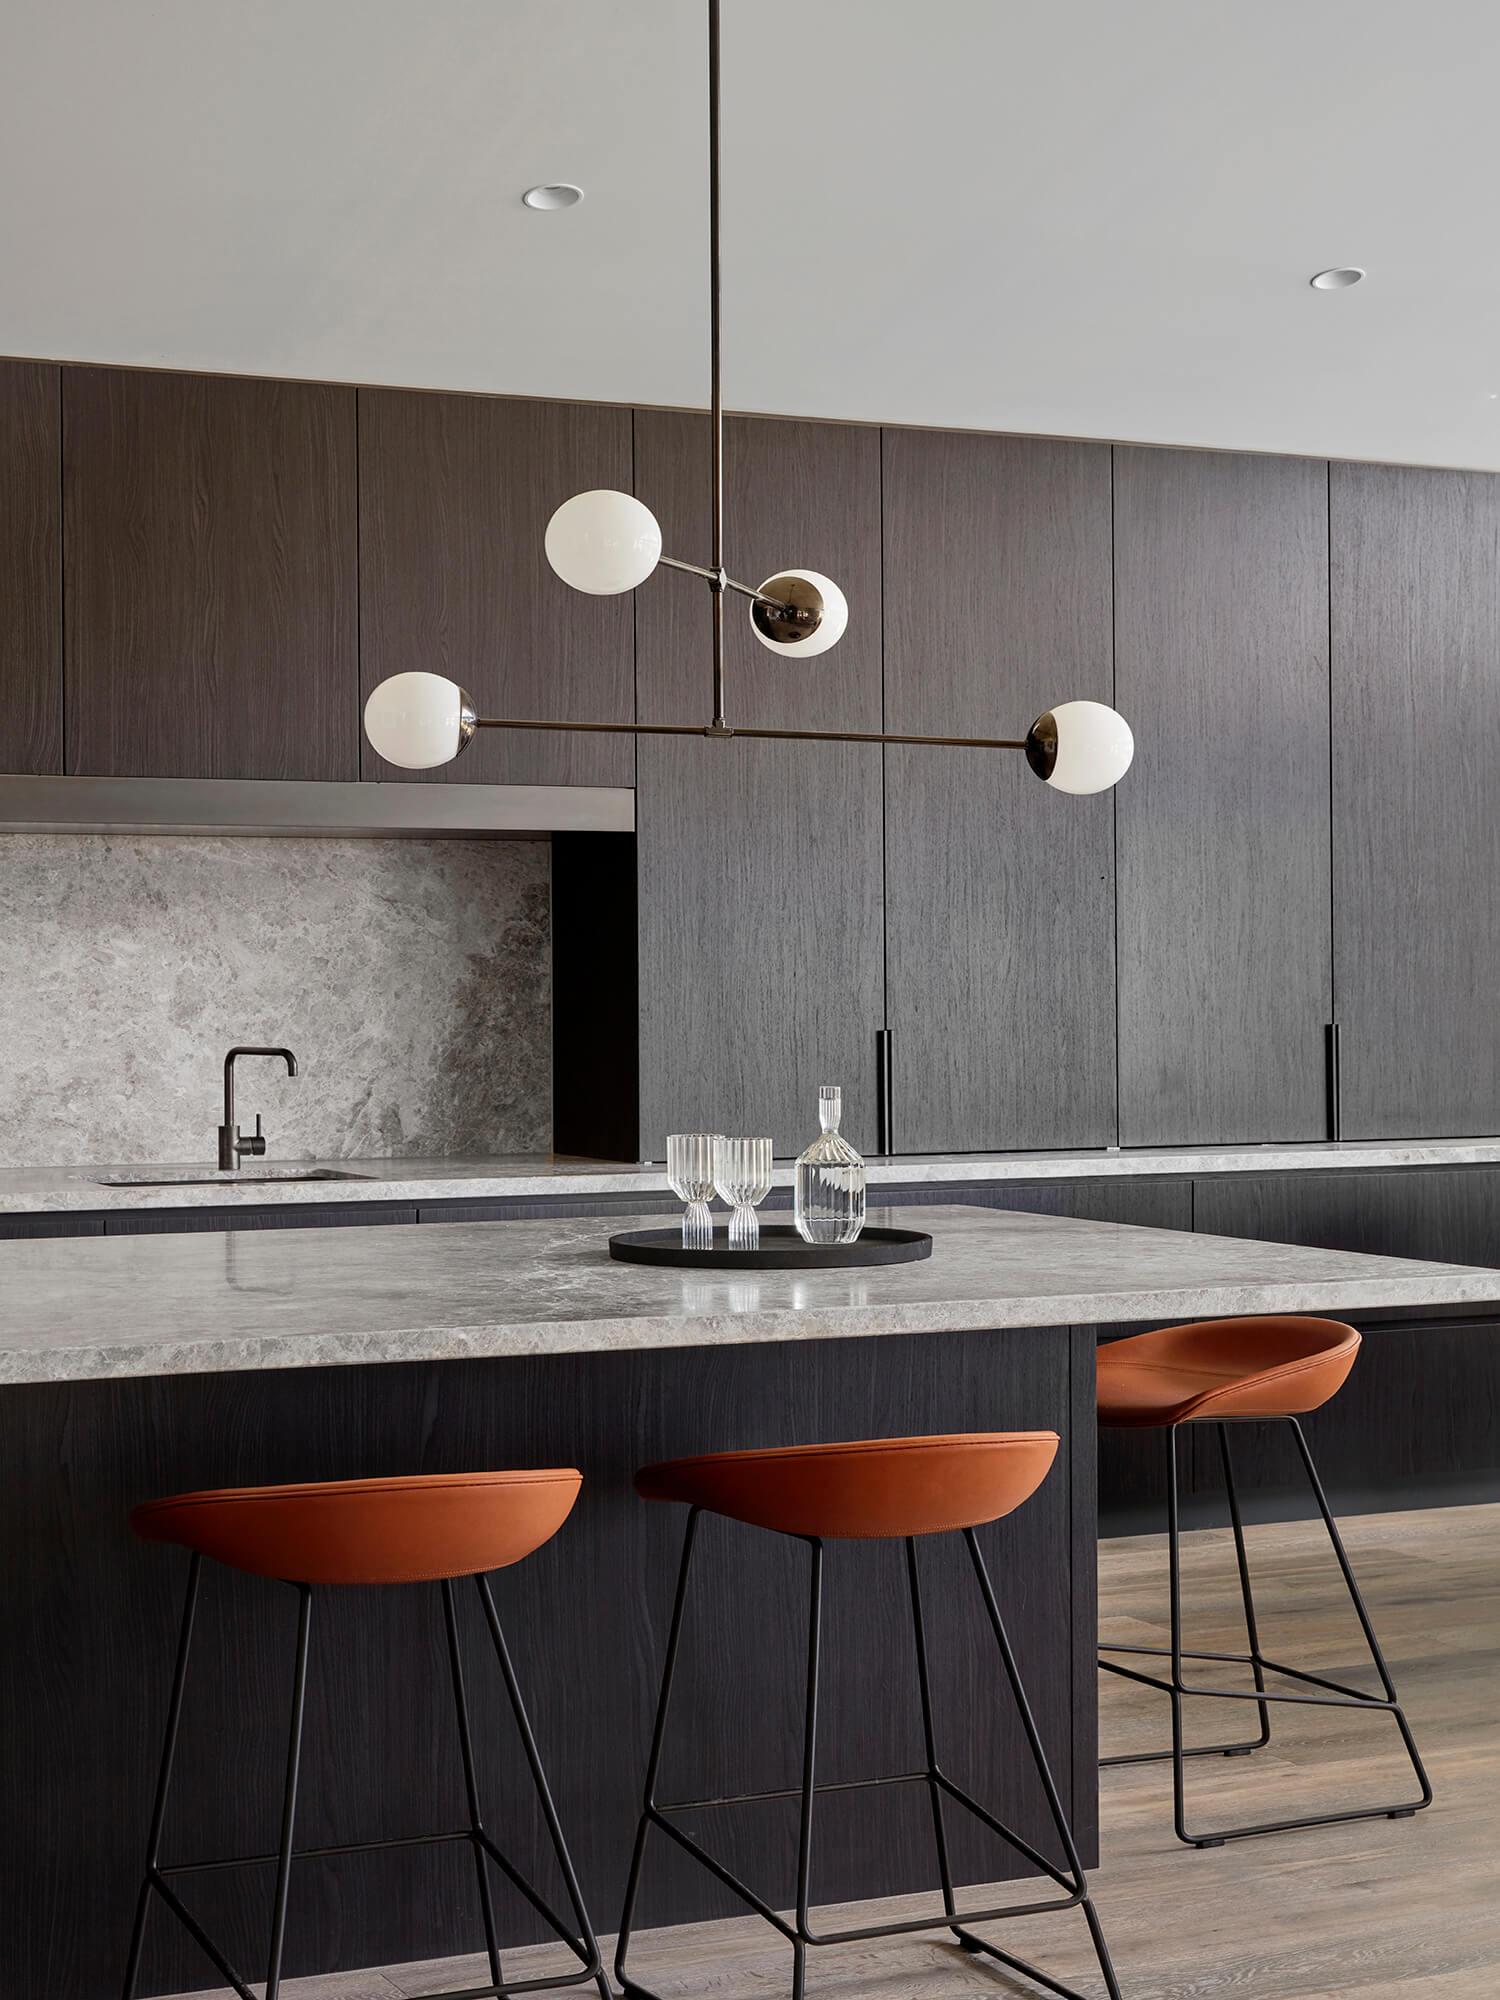 est living interiors Ceres Gable House Tecture 12